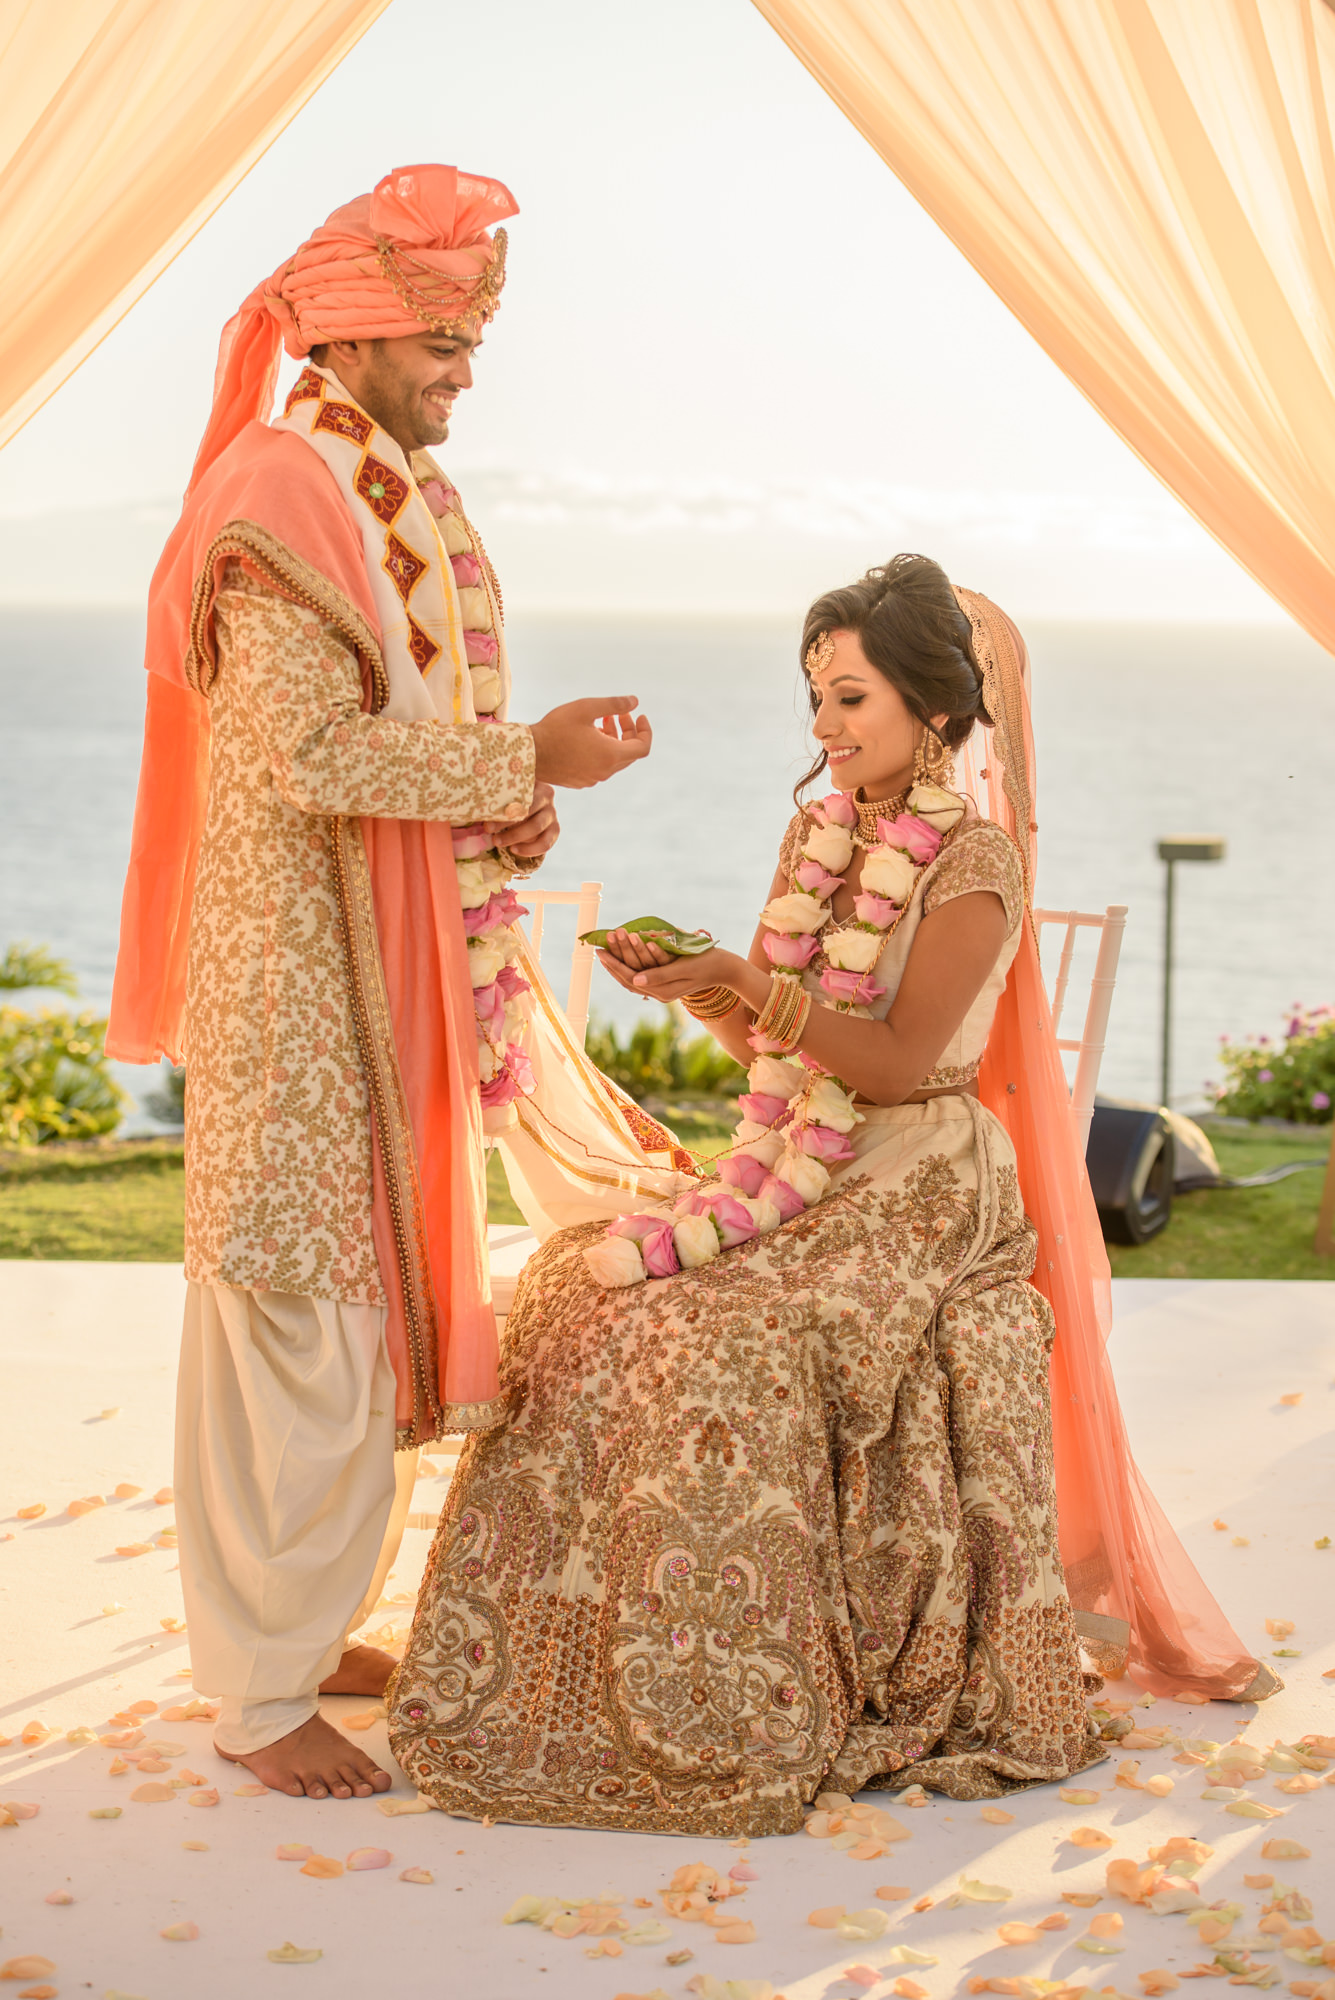 satnam photography wedding indian asian hindu destination wedding photographer tenerife ritz carlton abama-210.jpg